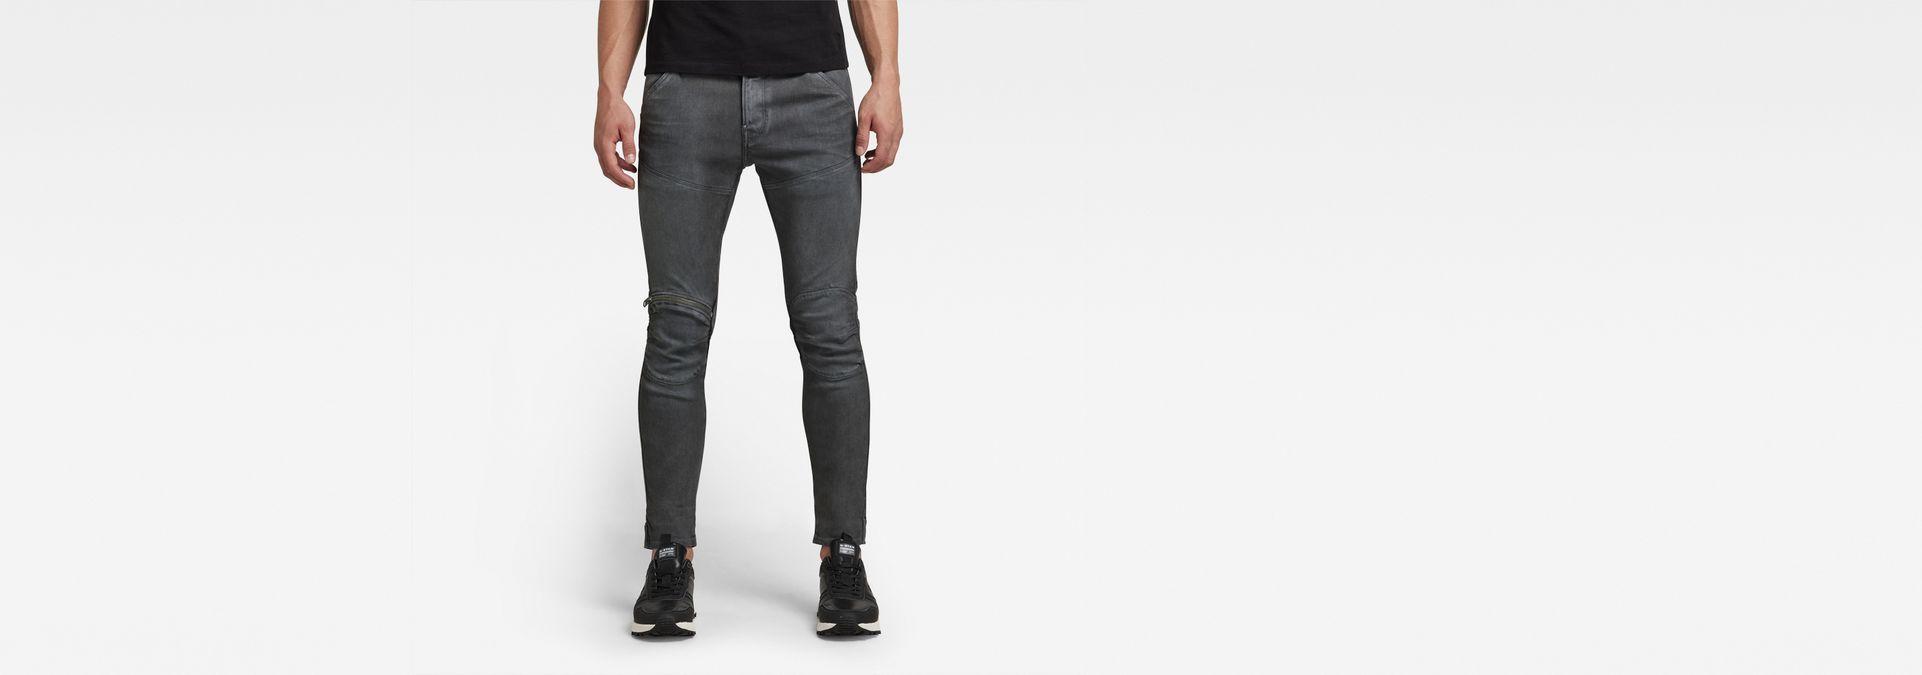 f8525ee0 G-Star RAW® 5620 3D Zip Knee Super Slim Jeans Grey ...